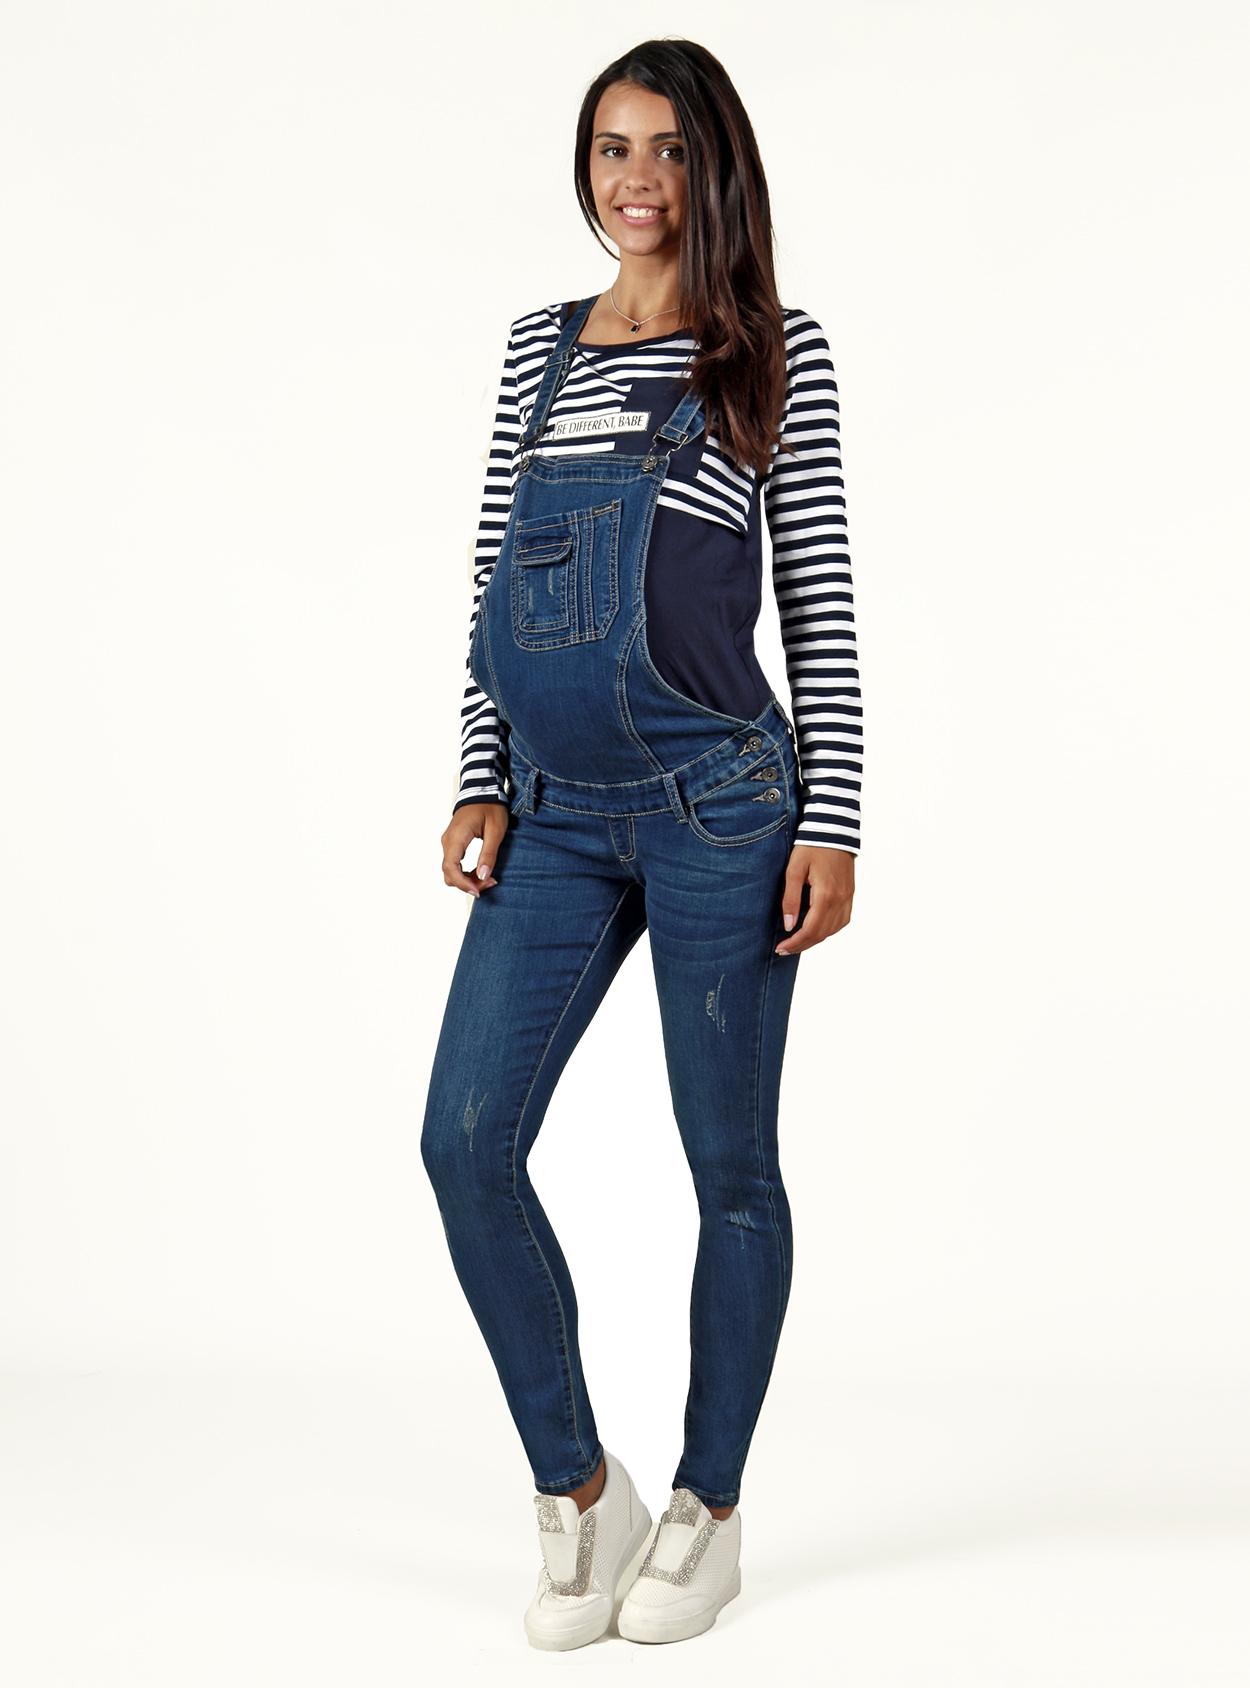 huge discount 9b089 b6086 Salopette premaman di jeans